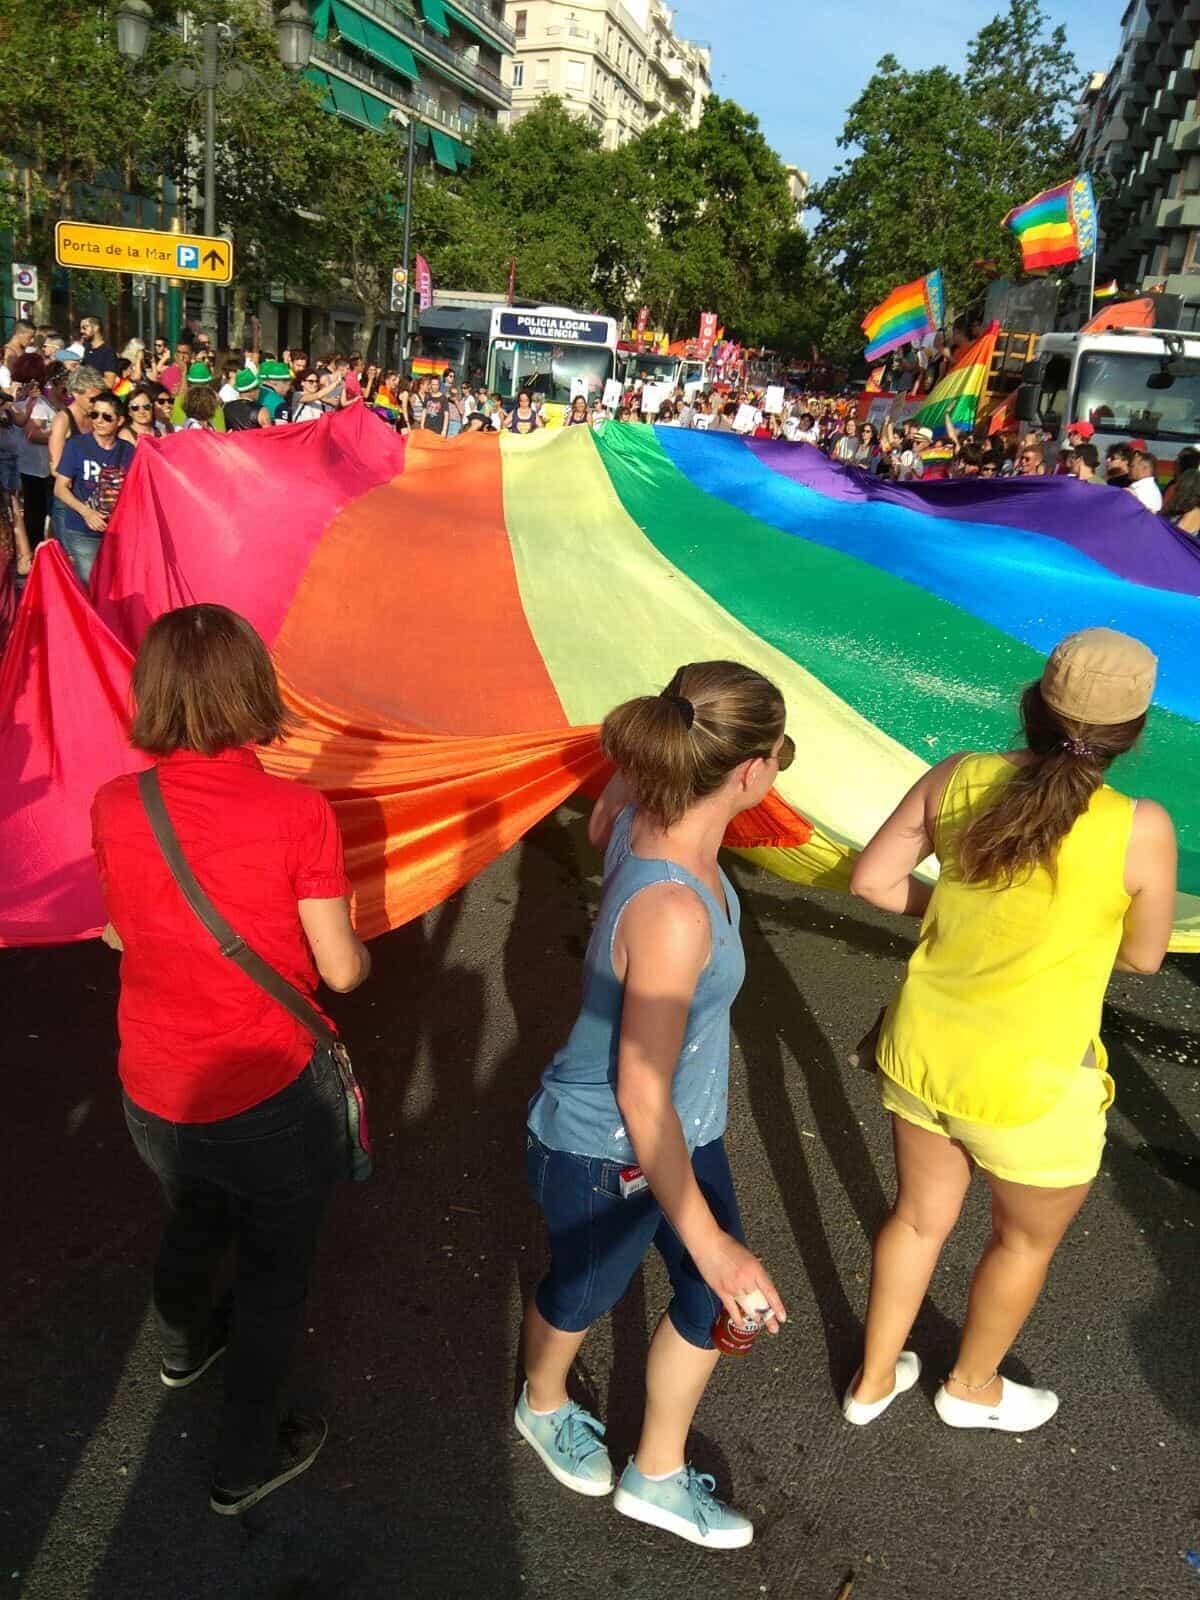 Orgullo2017 Over The Rainbow, Hay una lesbiana en mi sopa